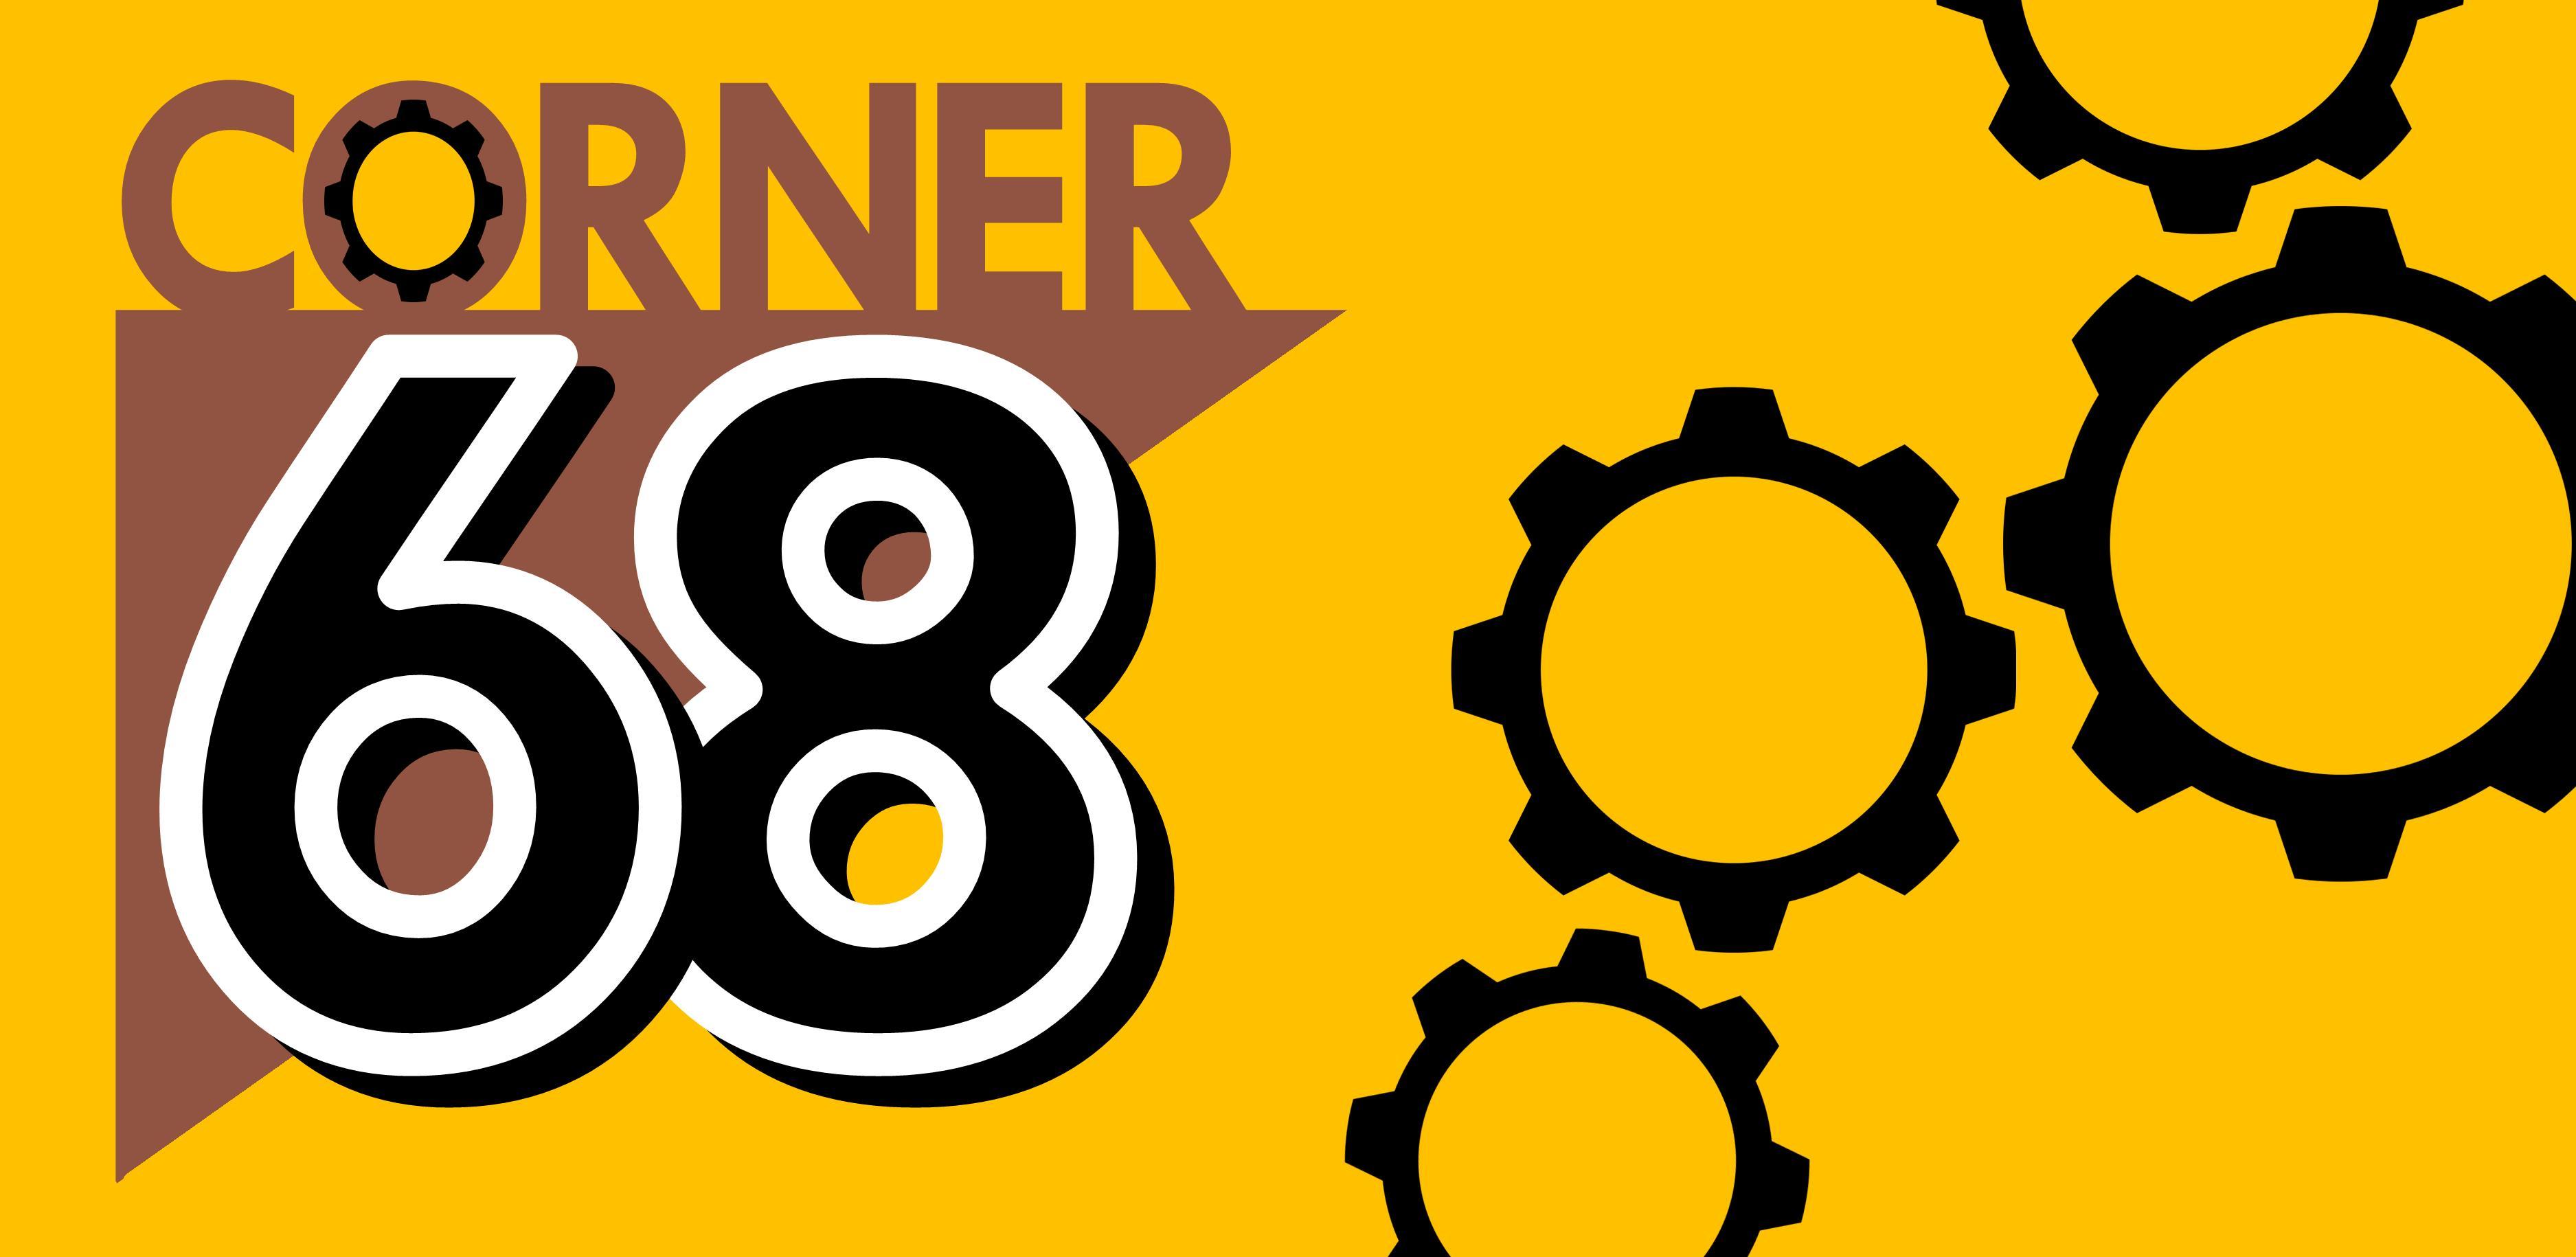 corner 68 logo/header